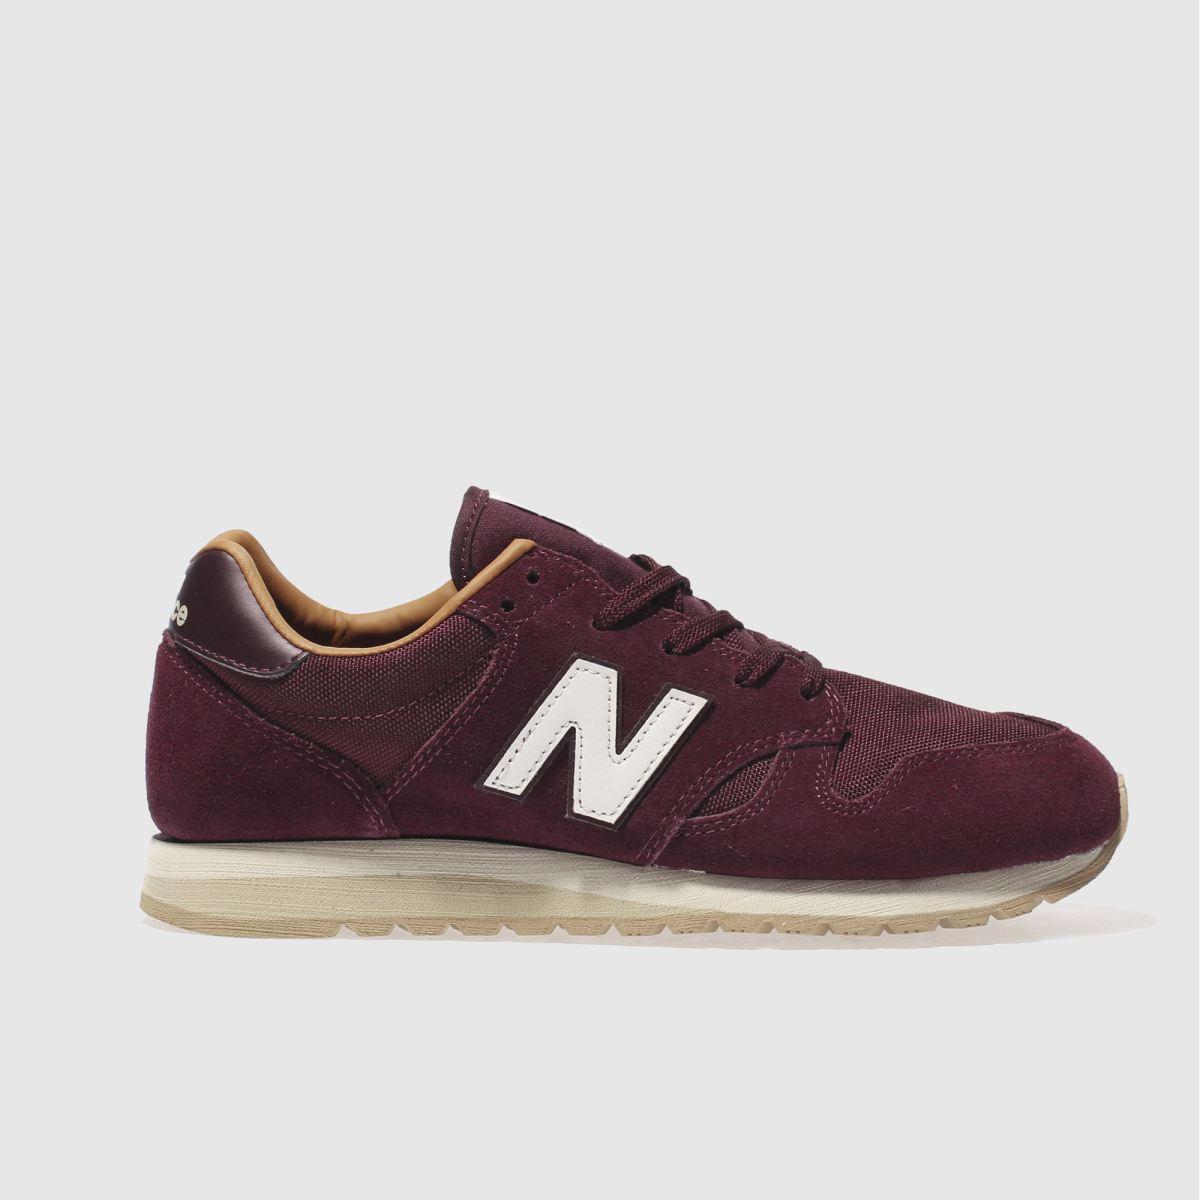 new balance burgundy 520 trainers